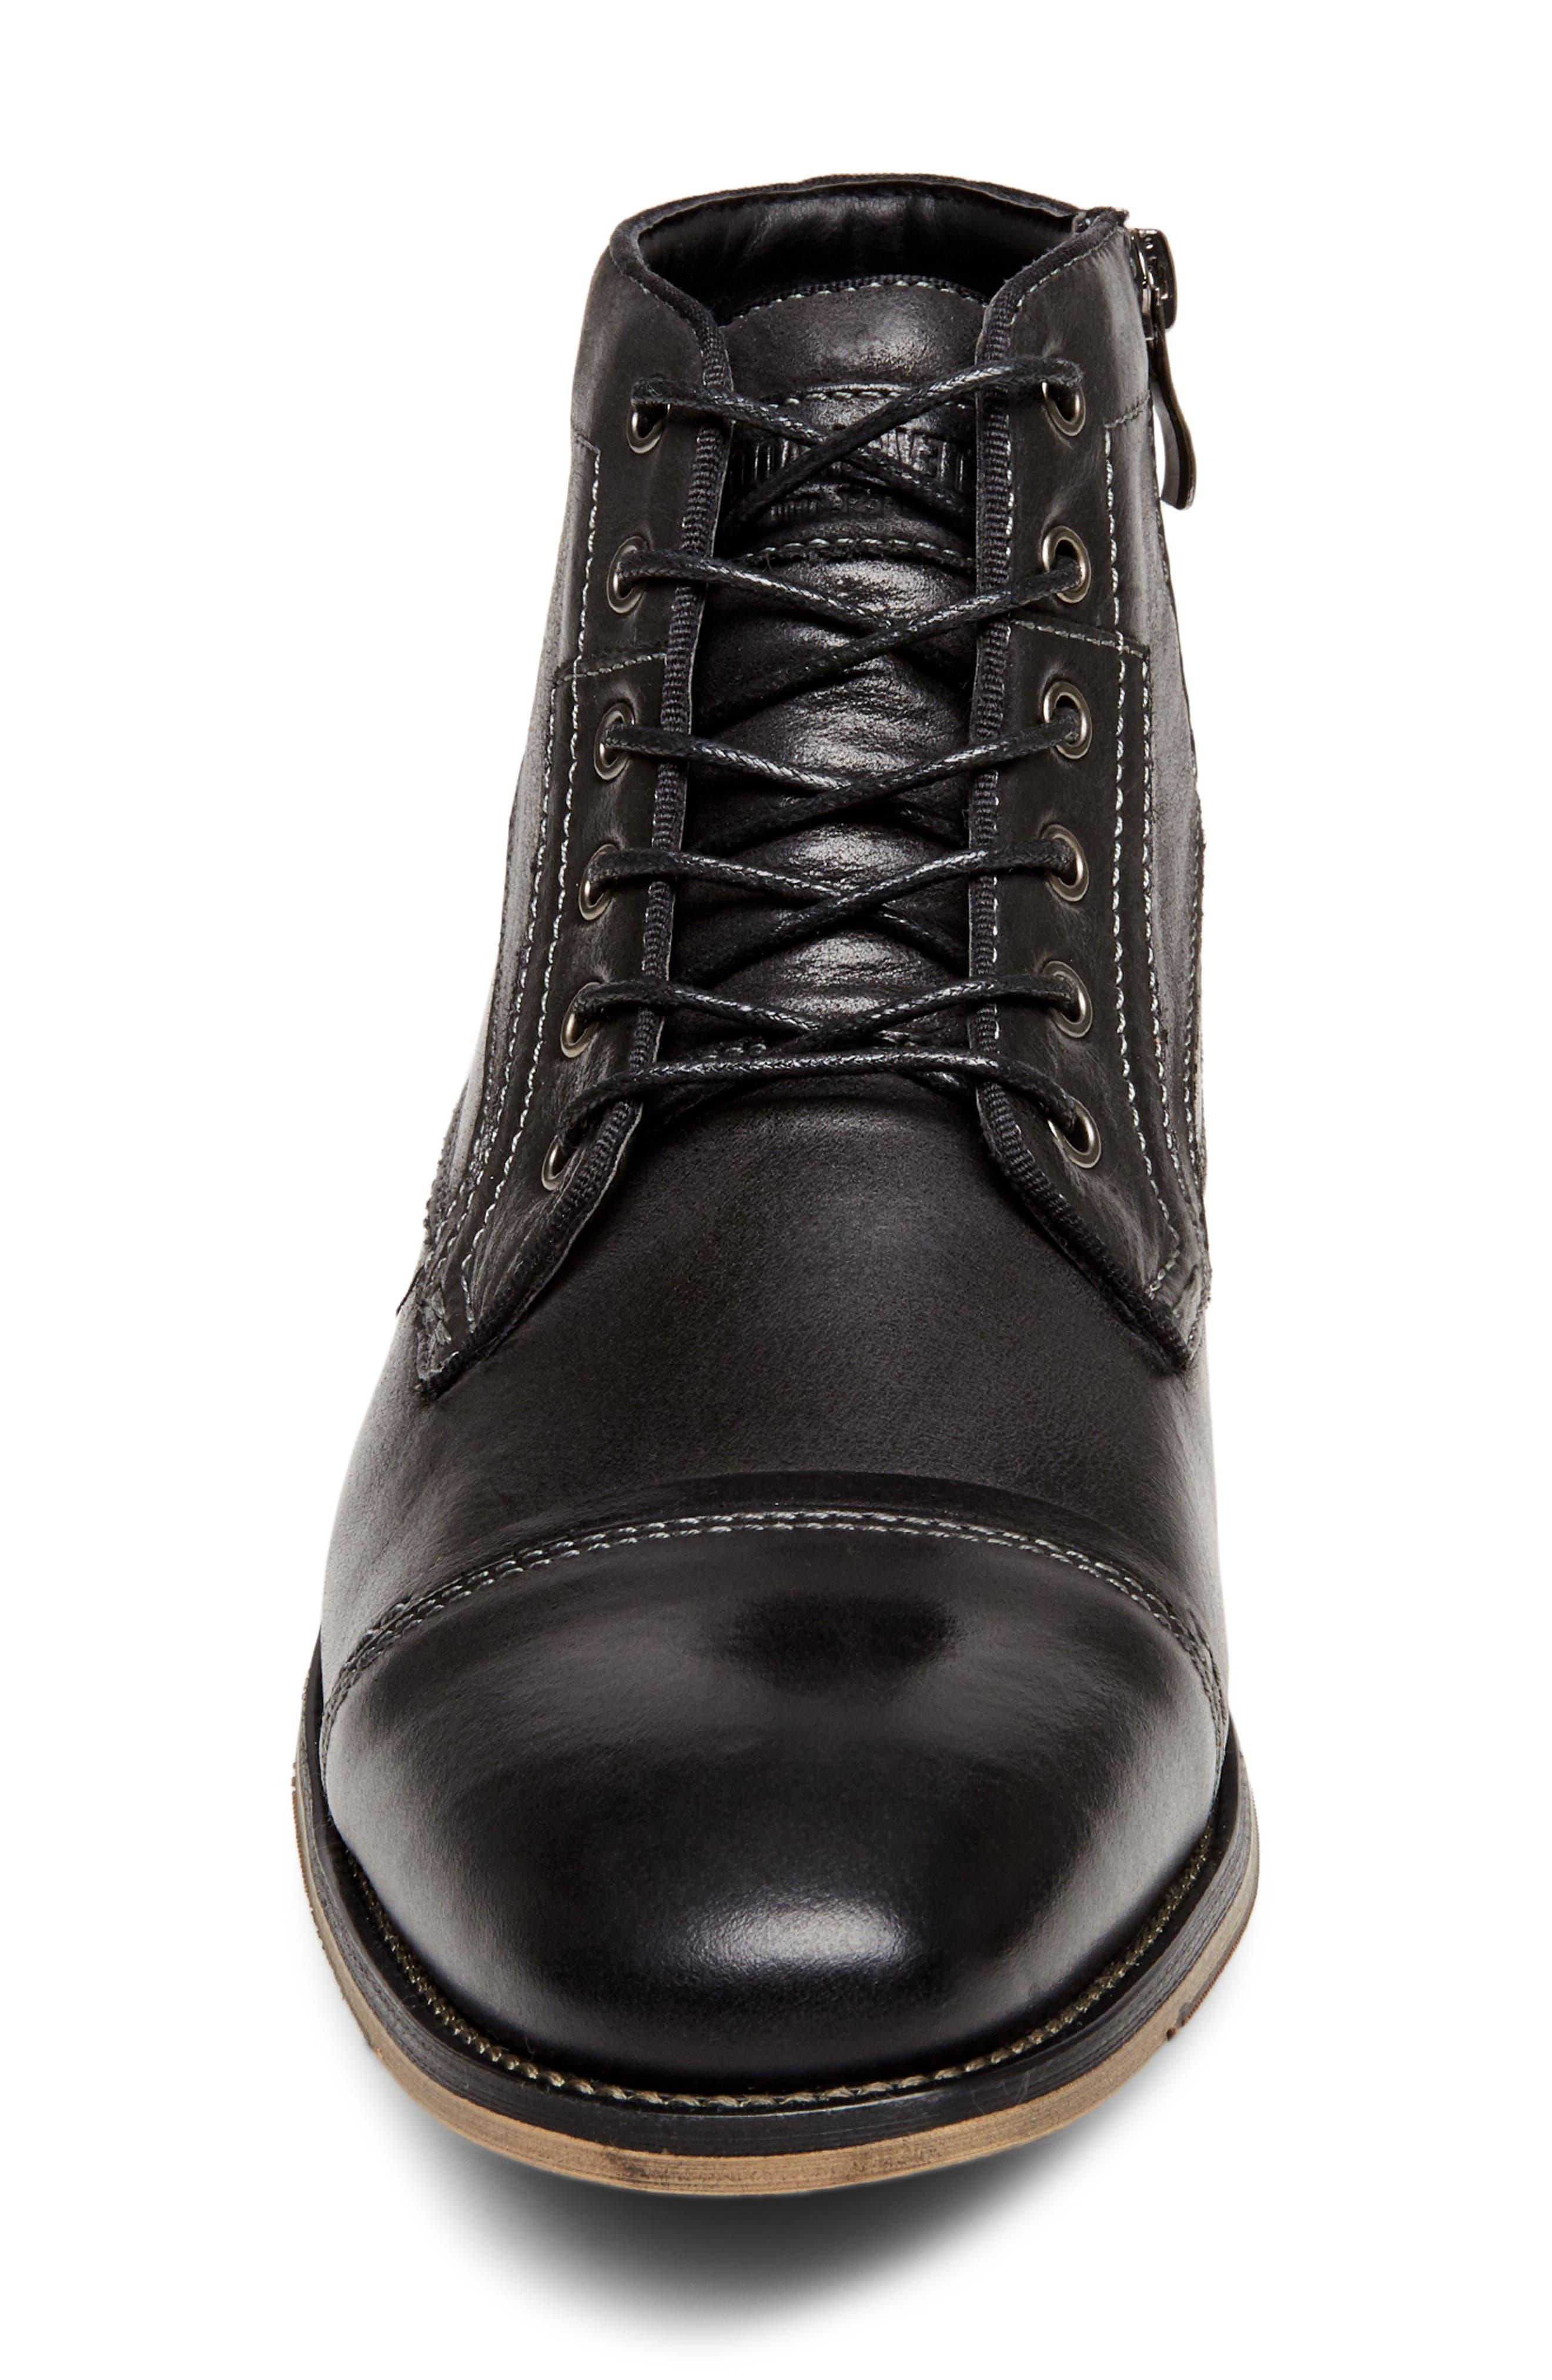 Jeffries Cap Toe Boot,                             Alternate thumbnail 4, color,                             074